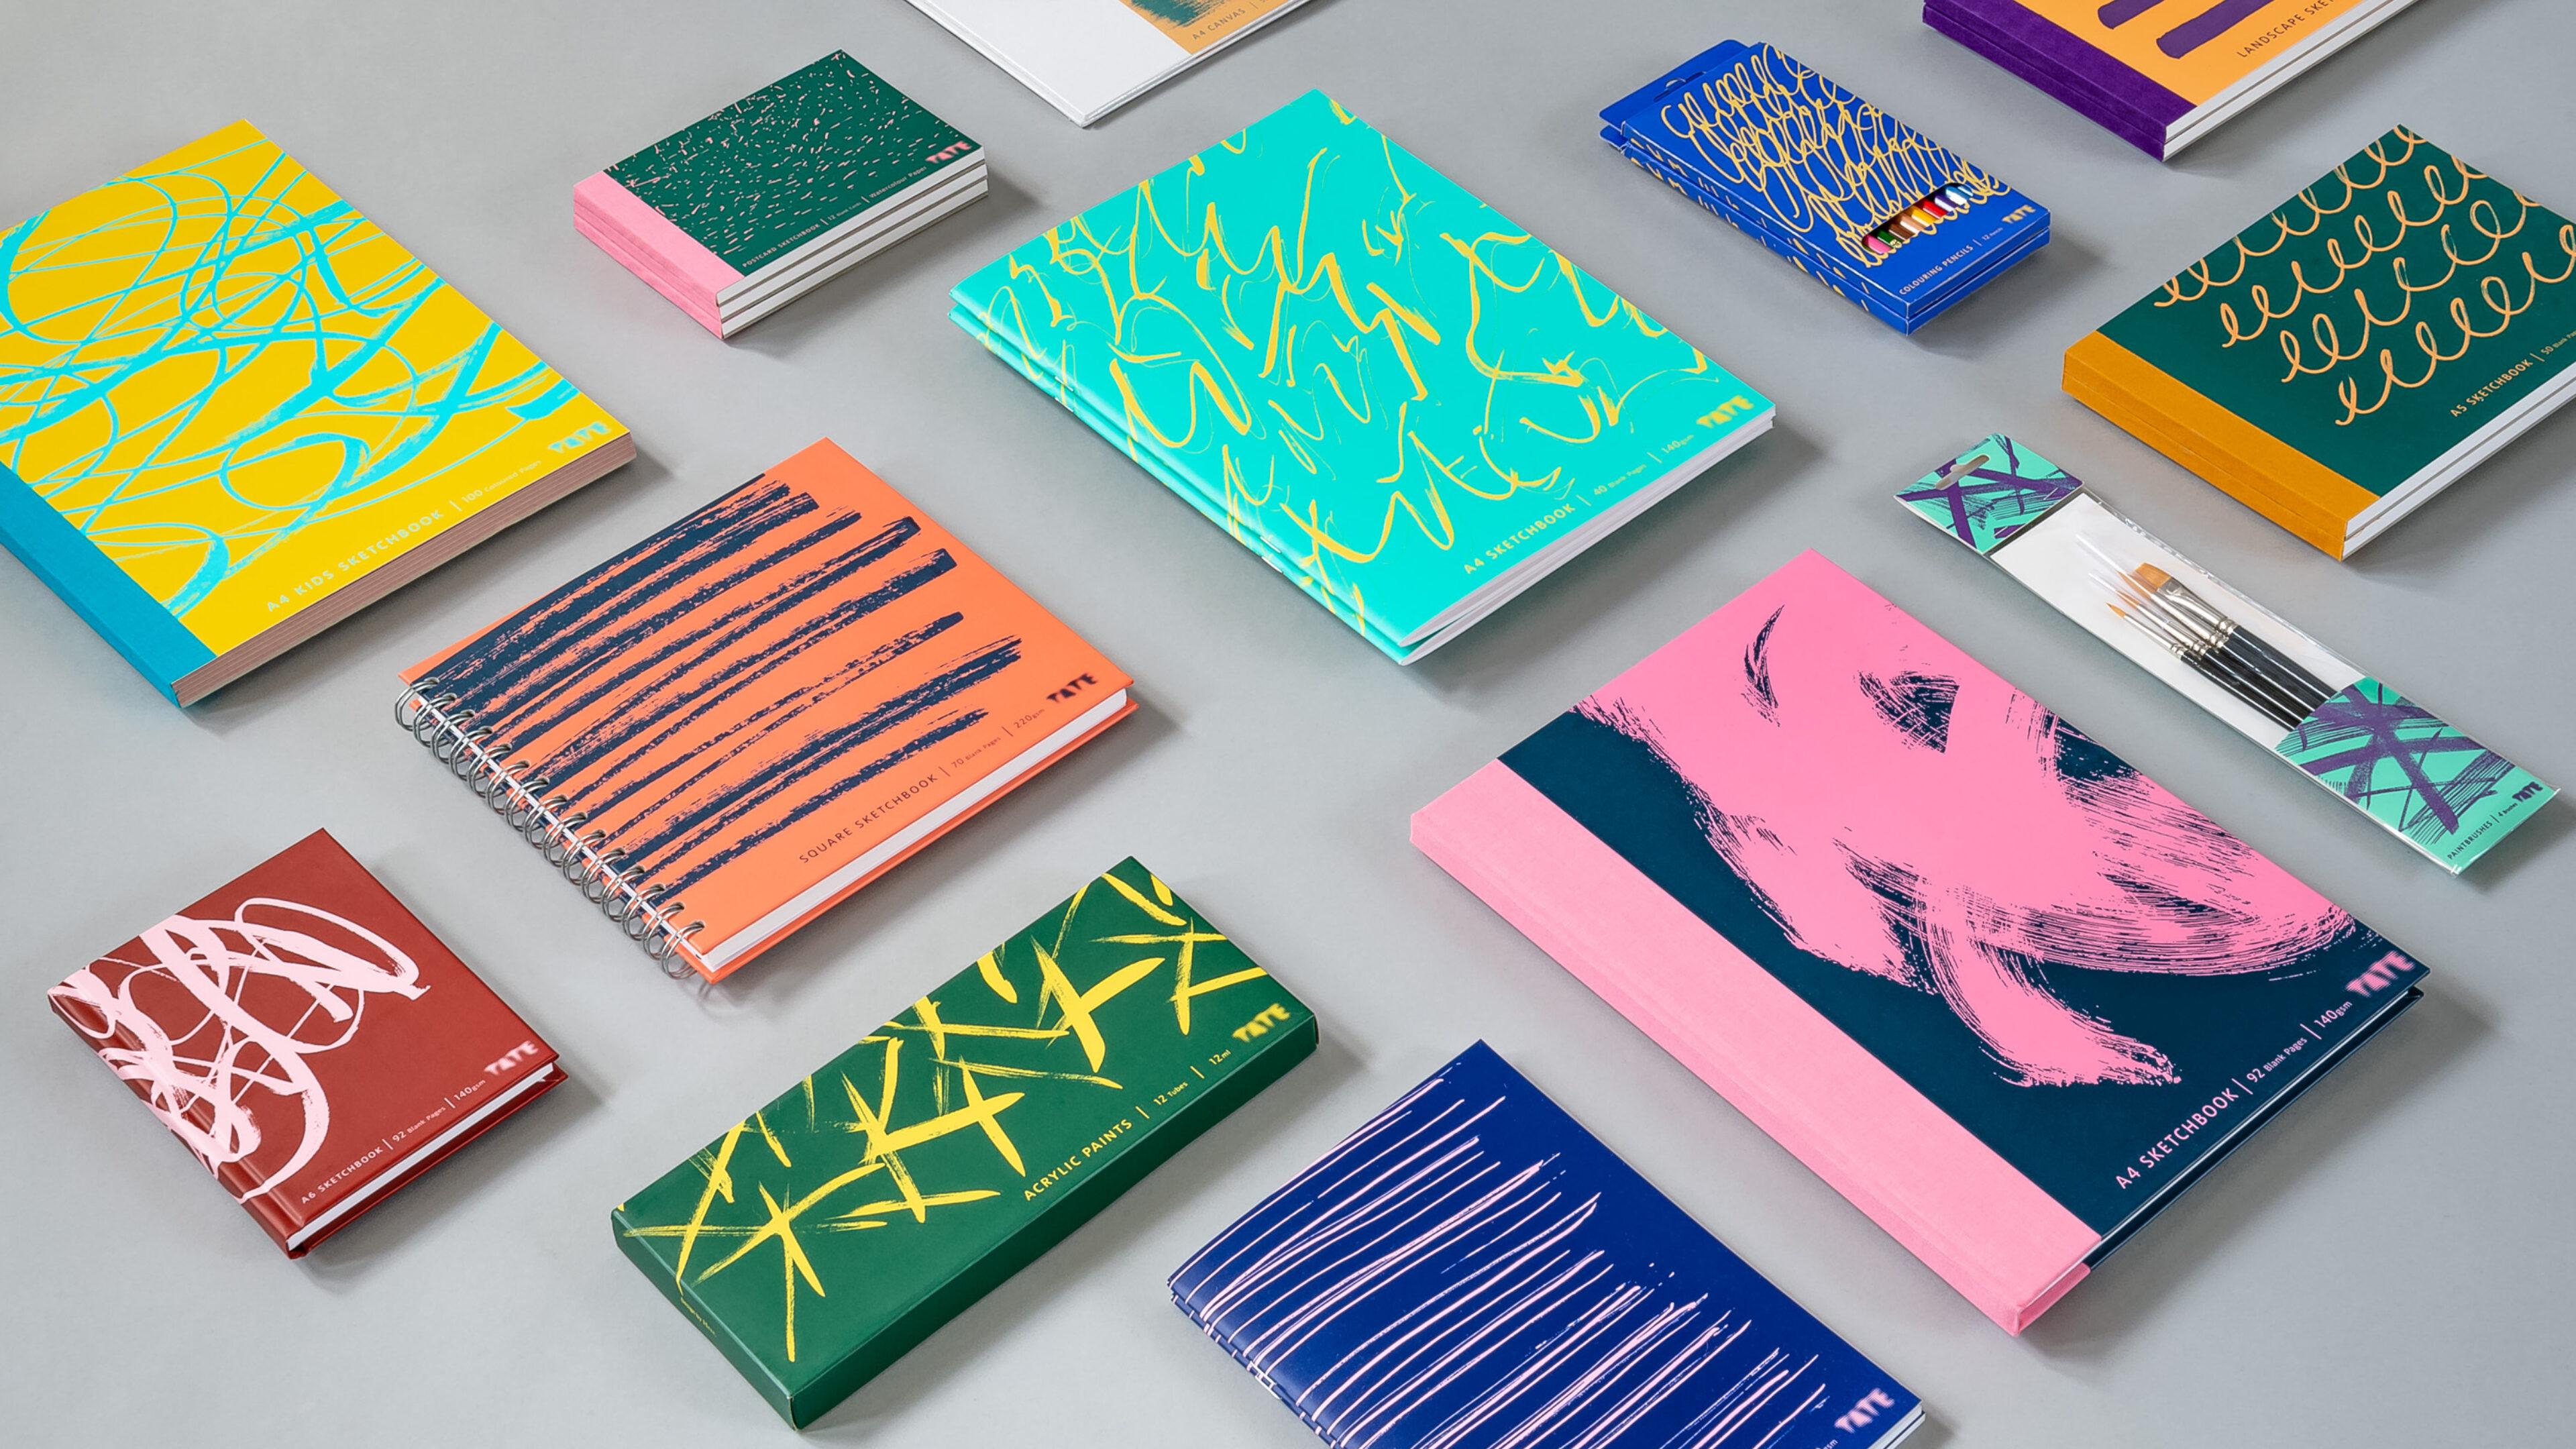 Tate art materials